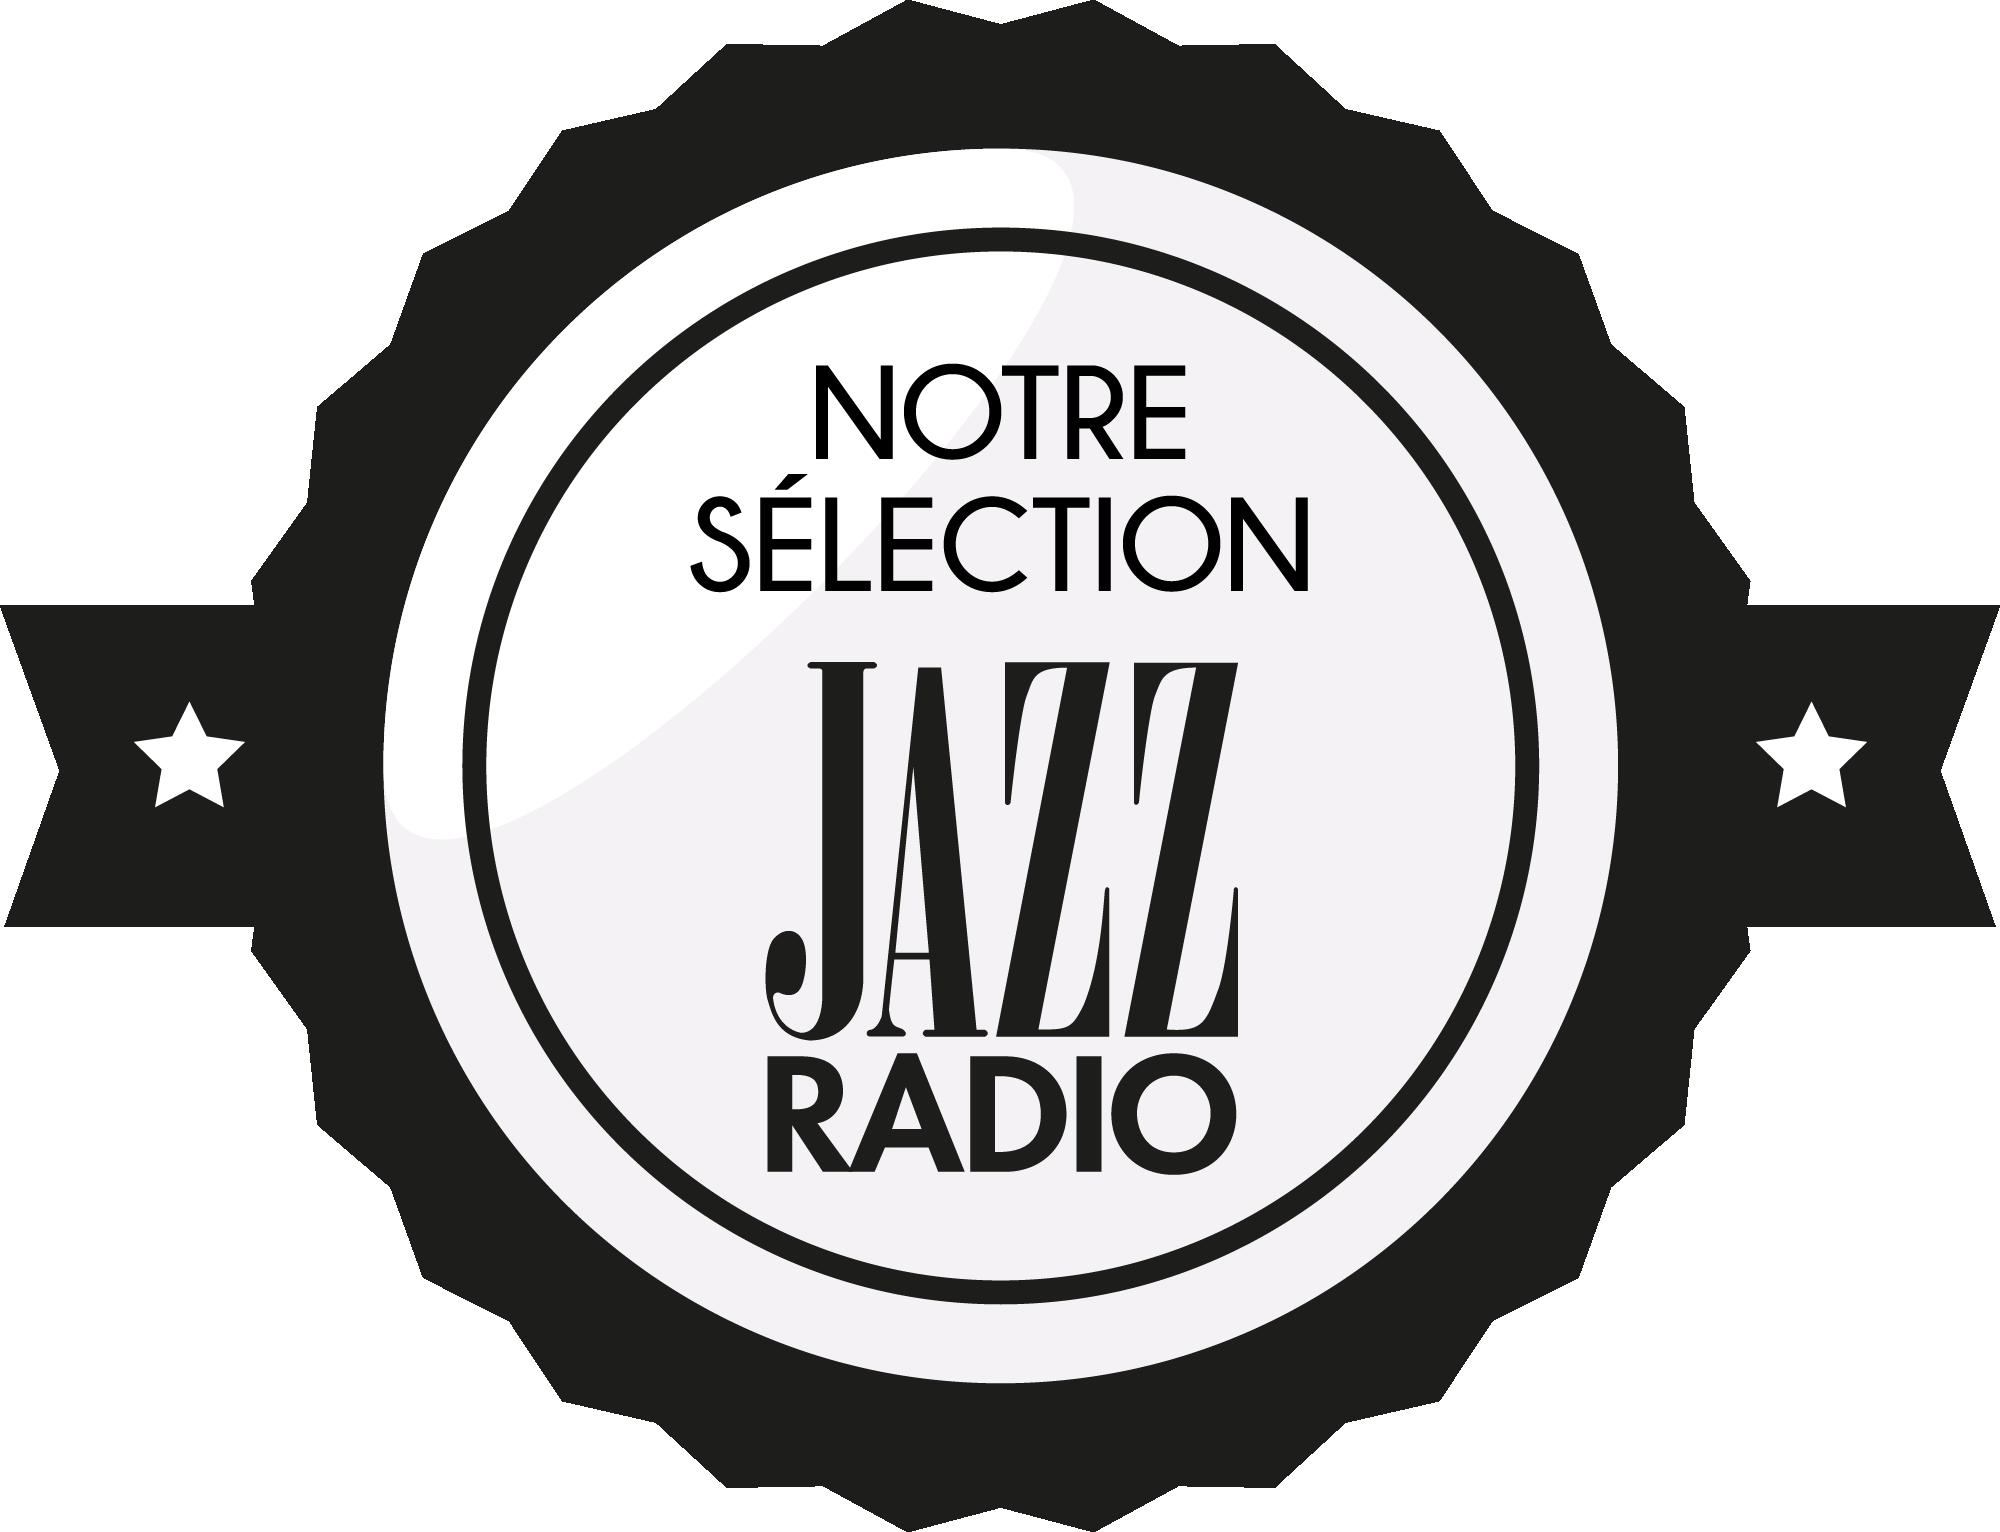 Notre sélection Jazz Radio